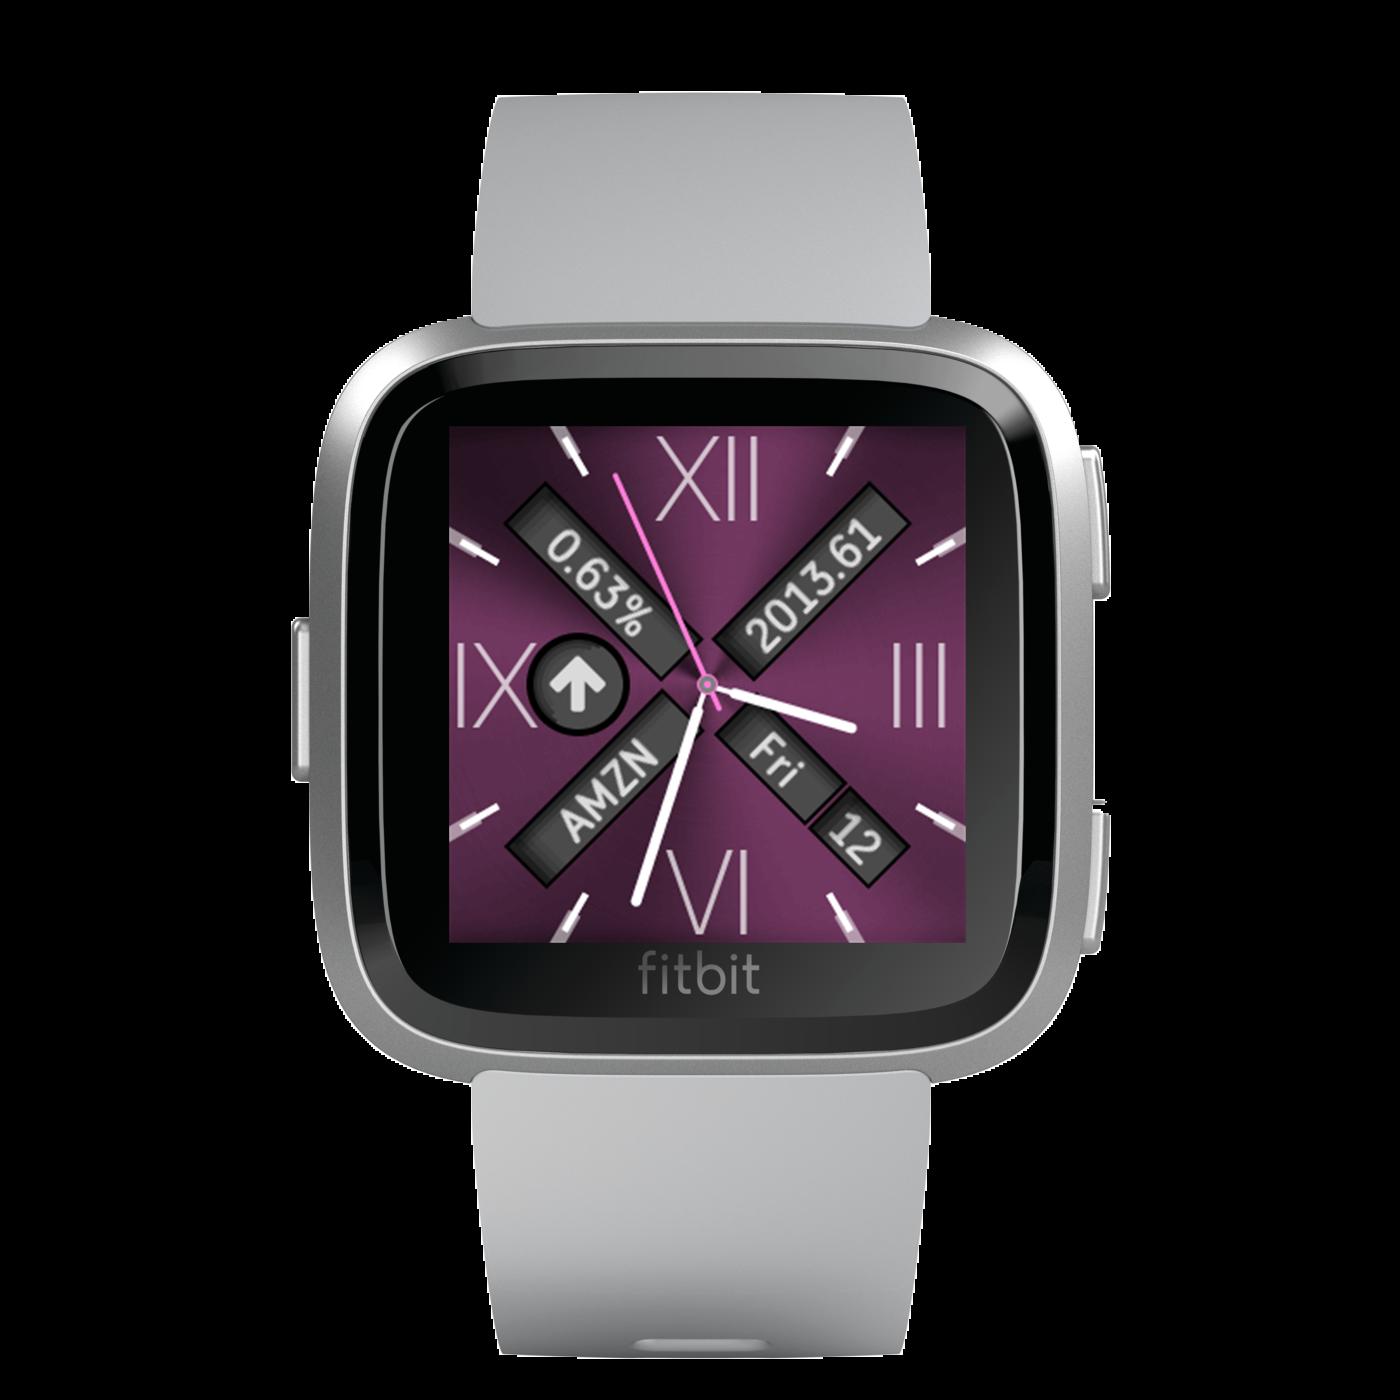 has amazing fitbit watchfaces